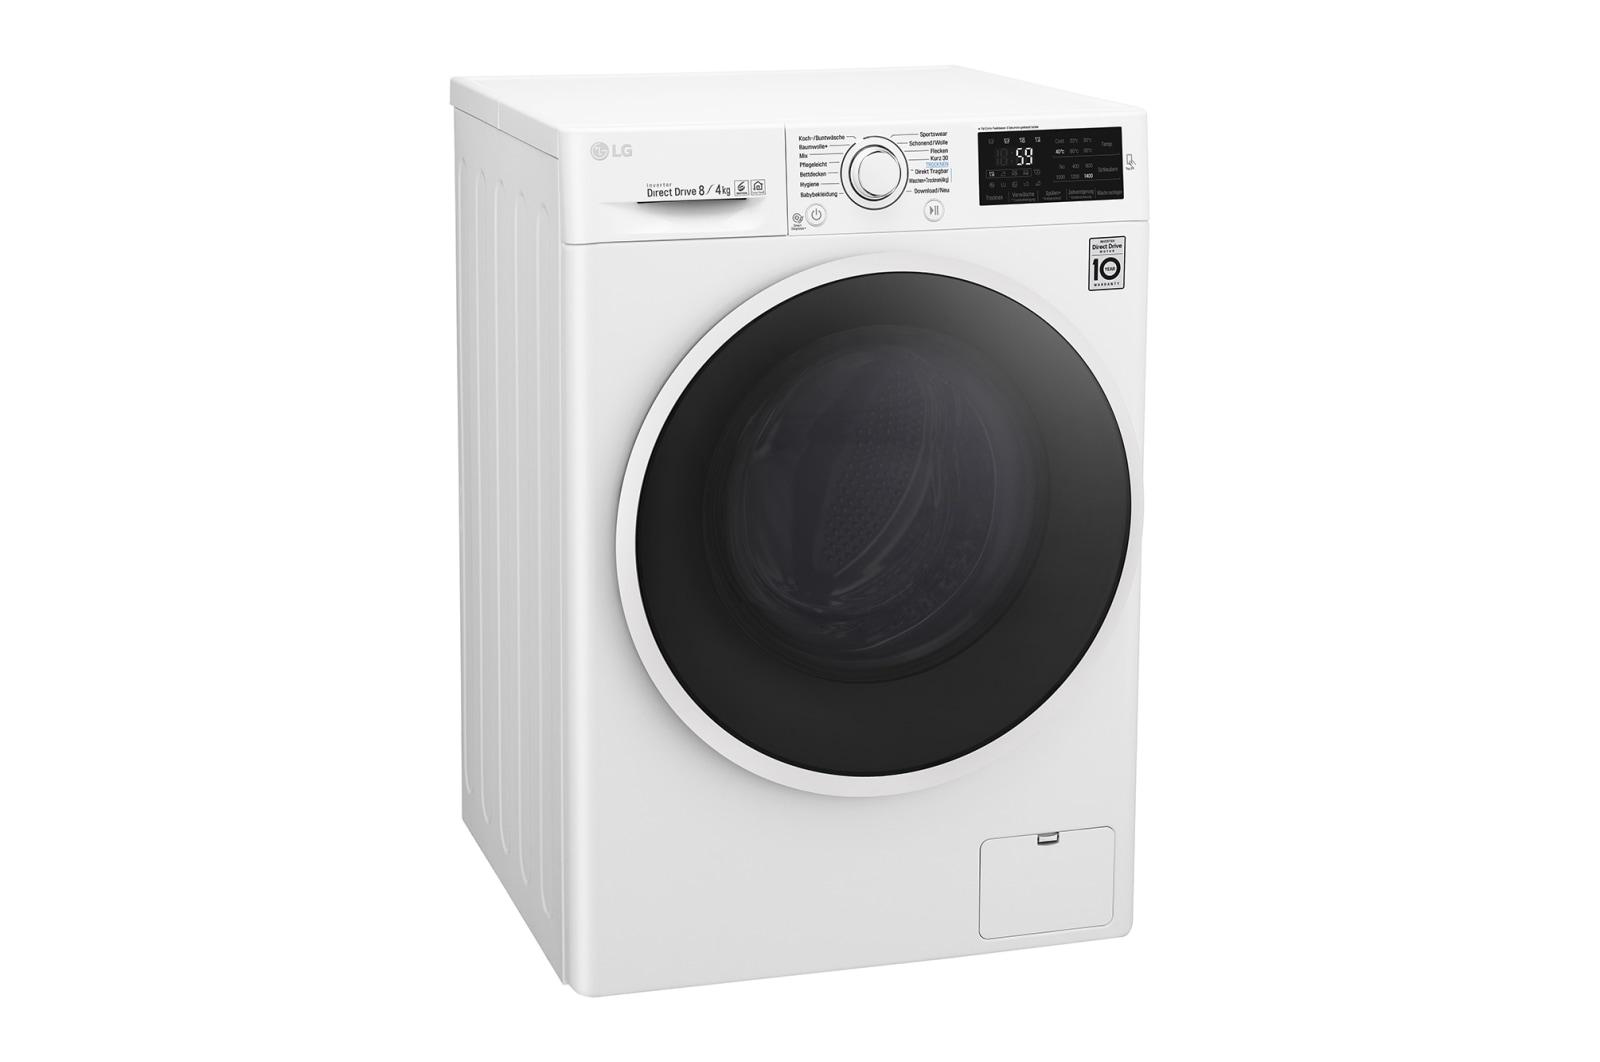 Lg waschtrockner serie 5 8 kg waschen 4 kg trocknen a